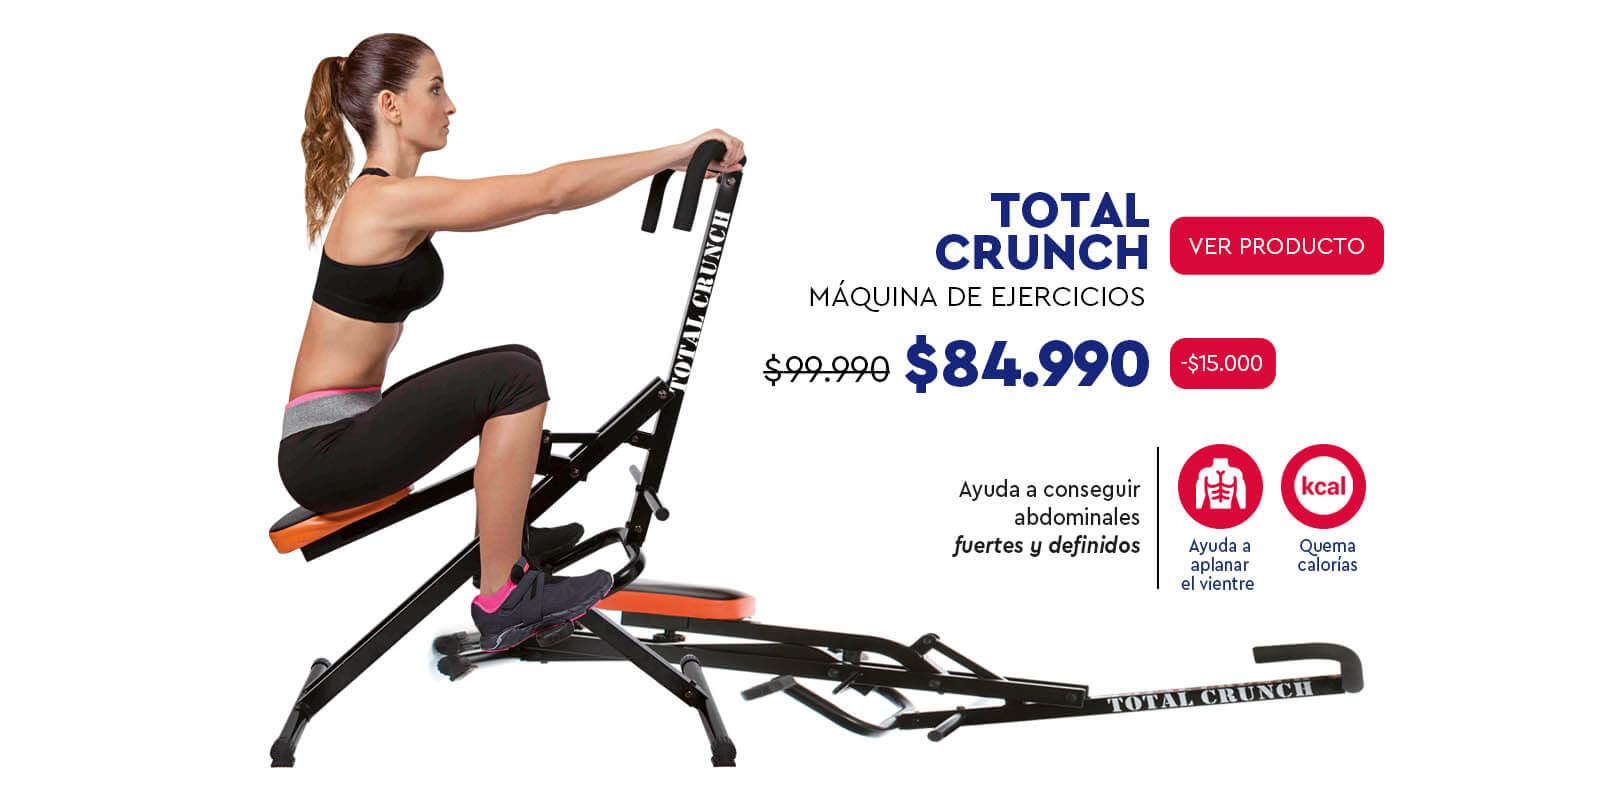 TotalCrunch